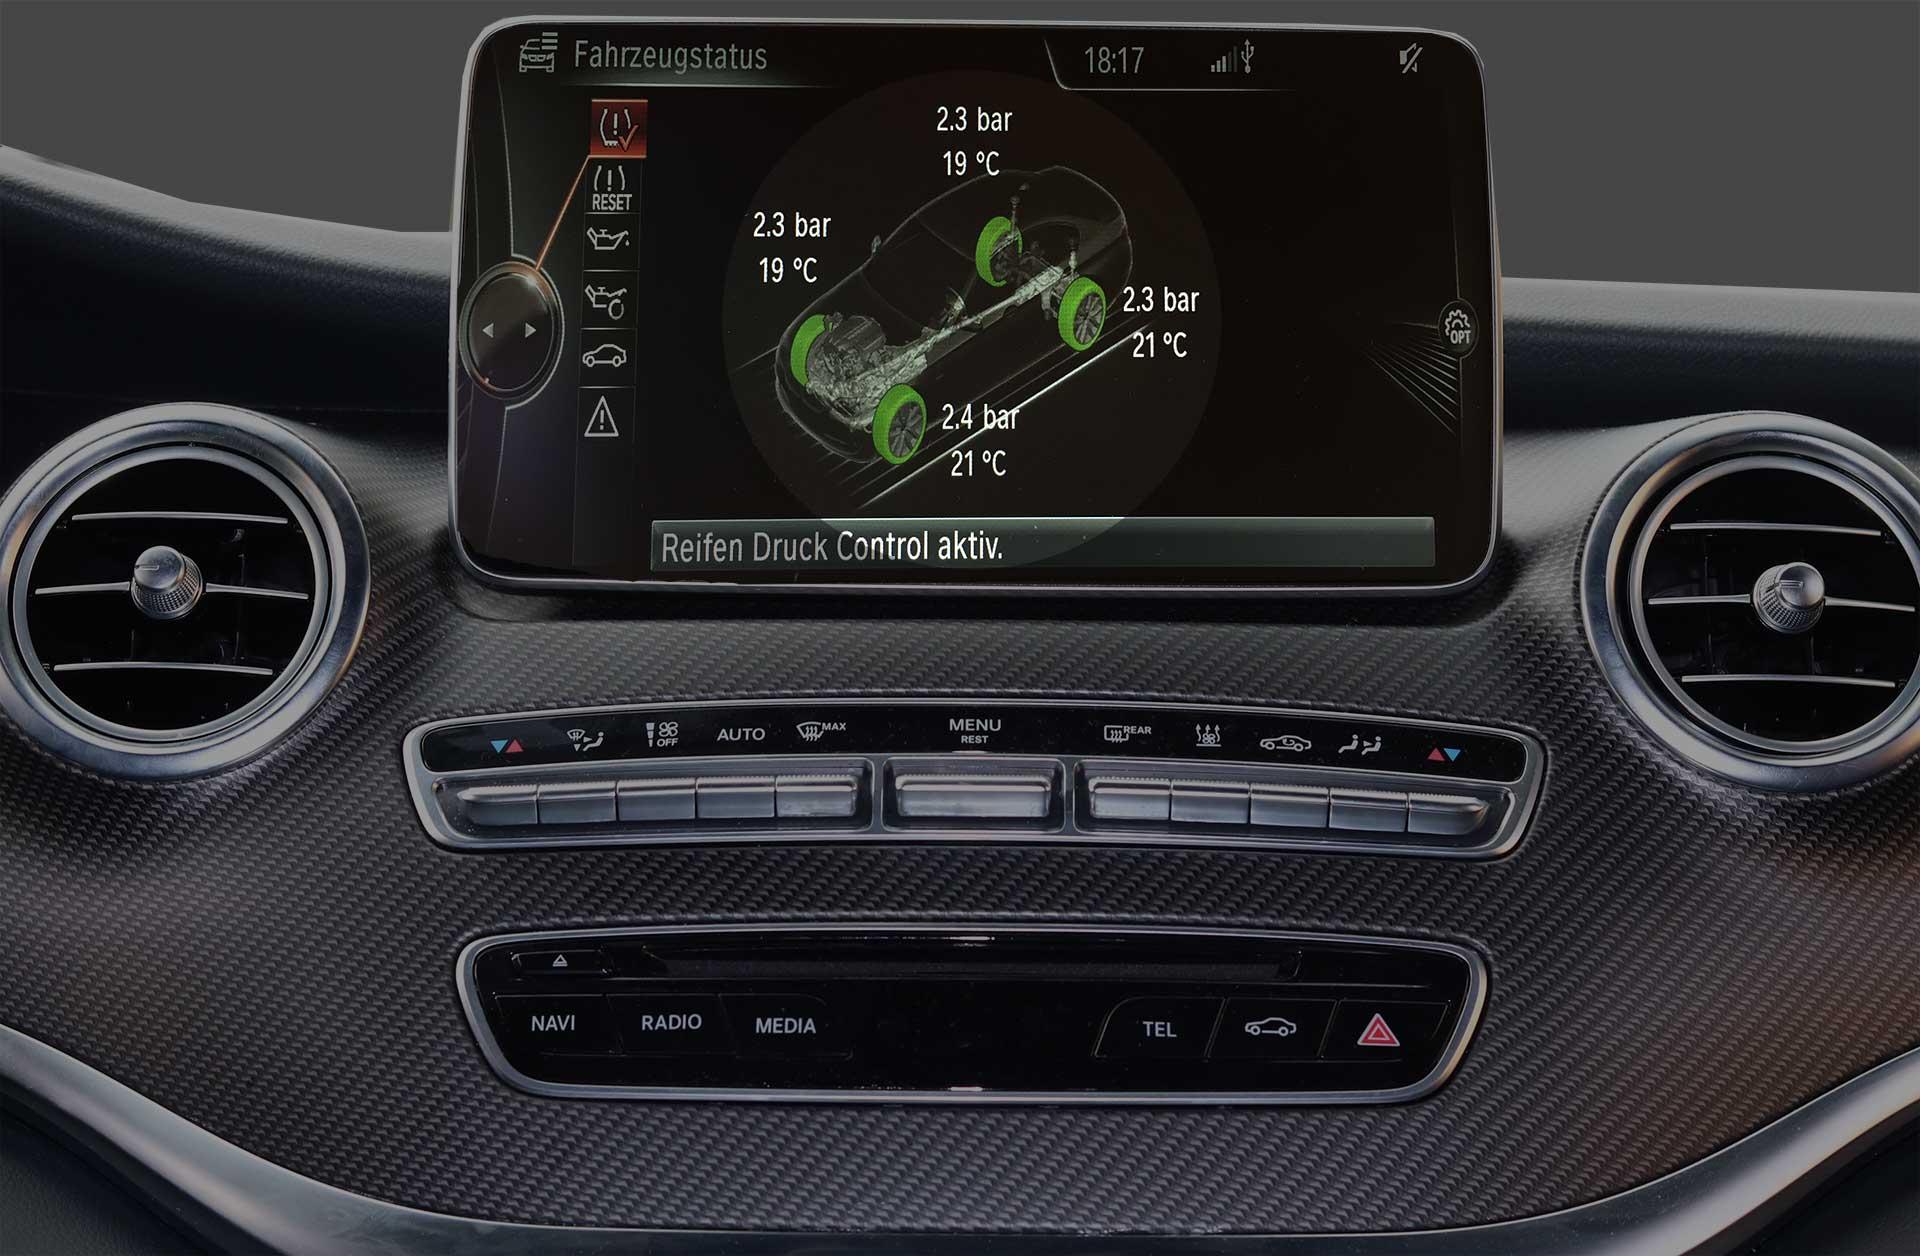 Fahrzeug Cockpit mit RDKS